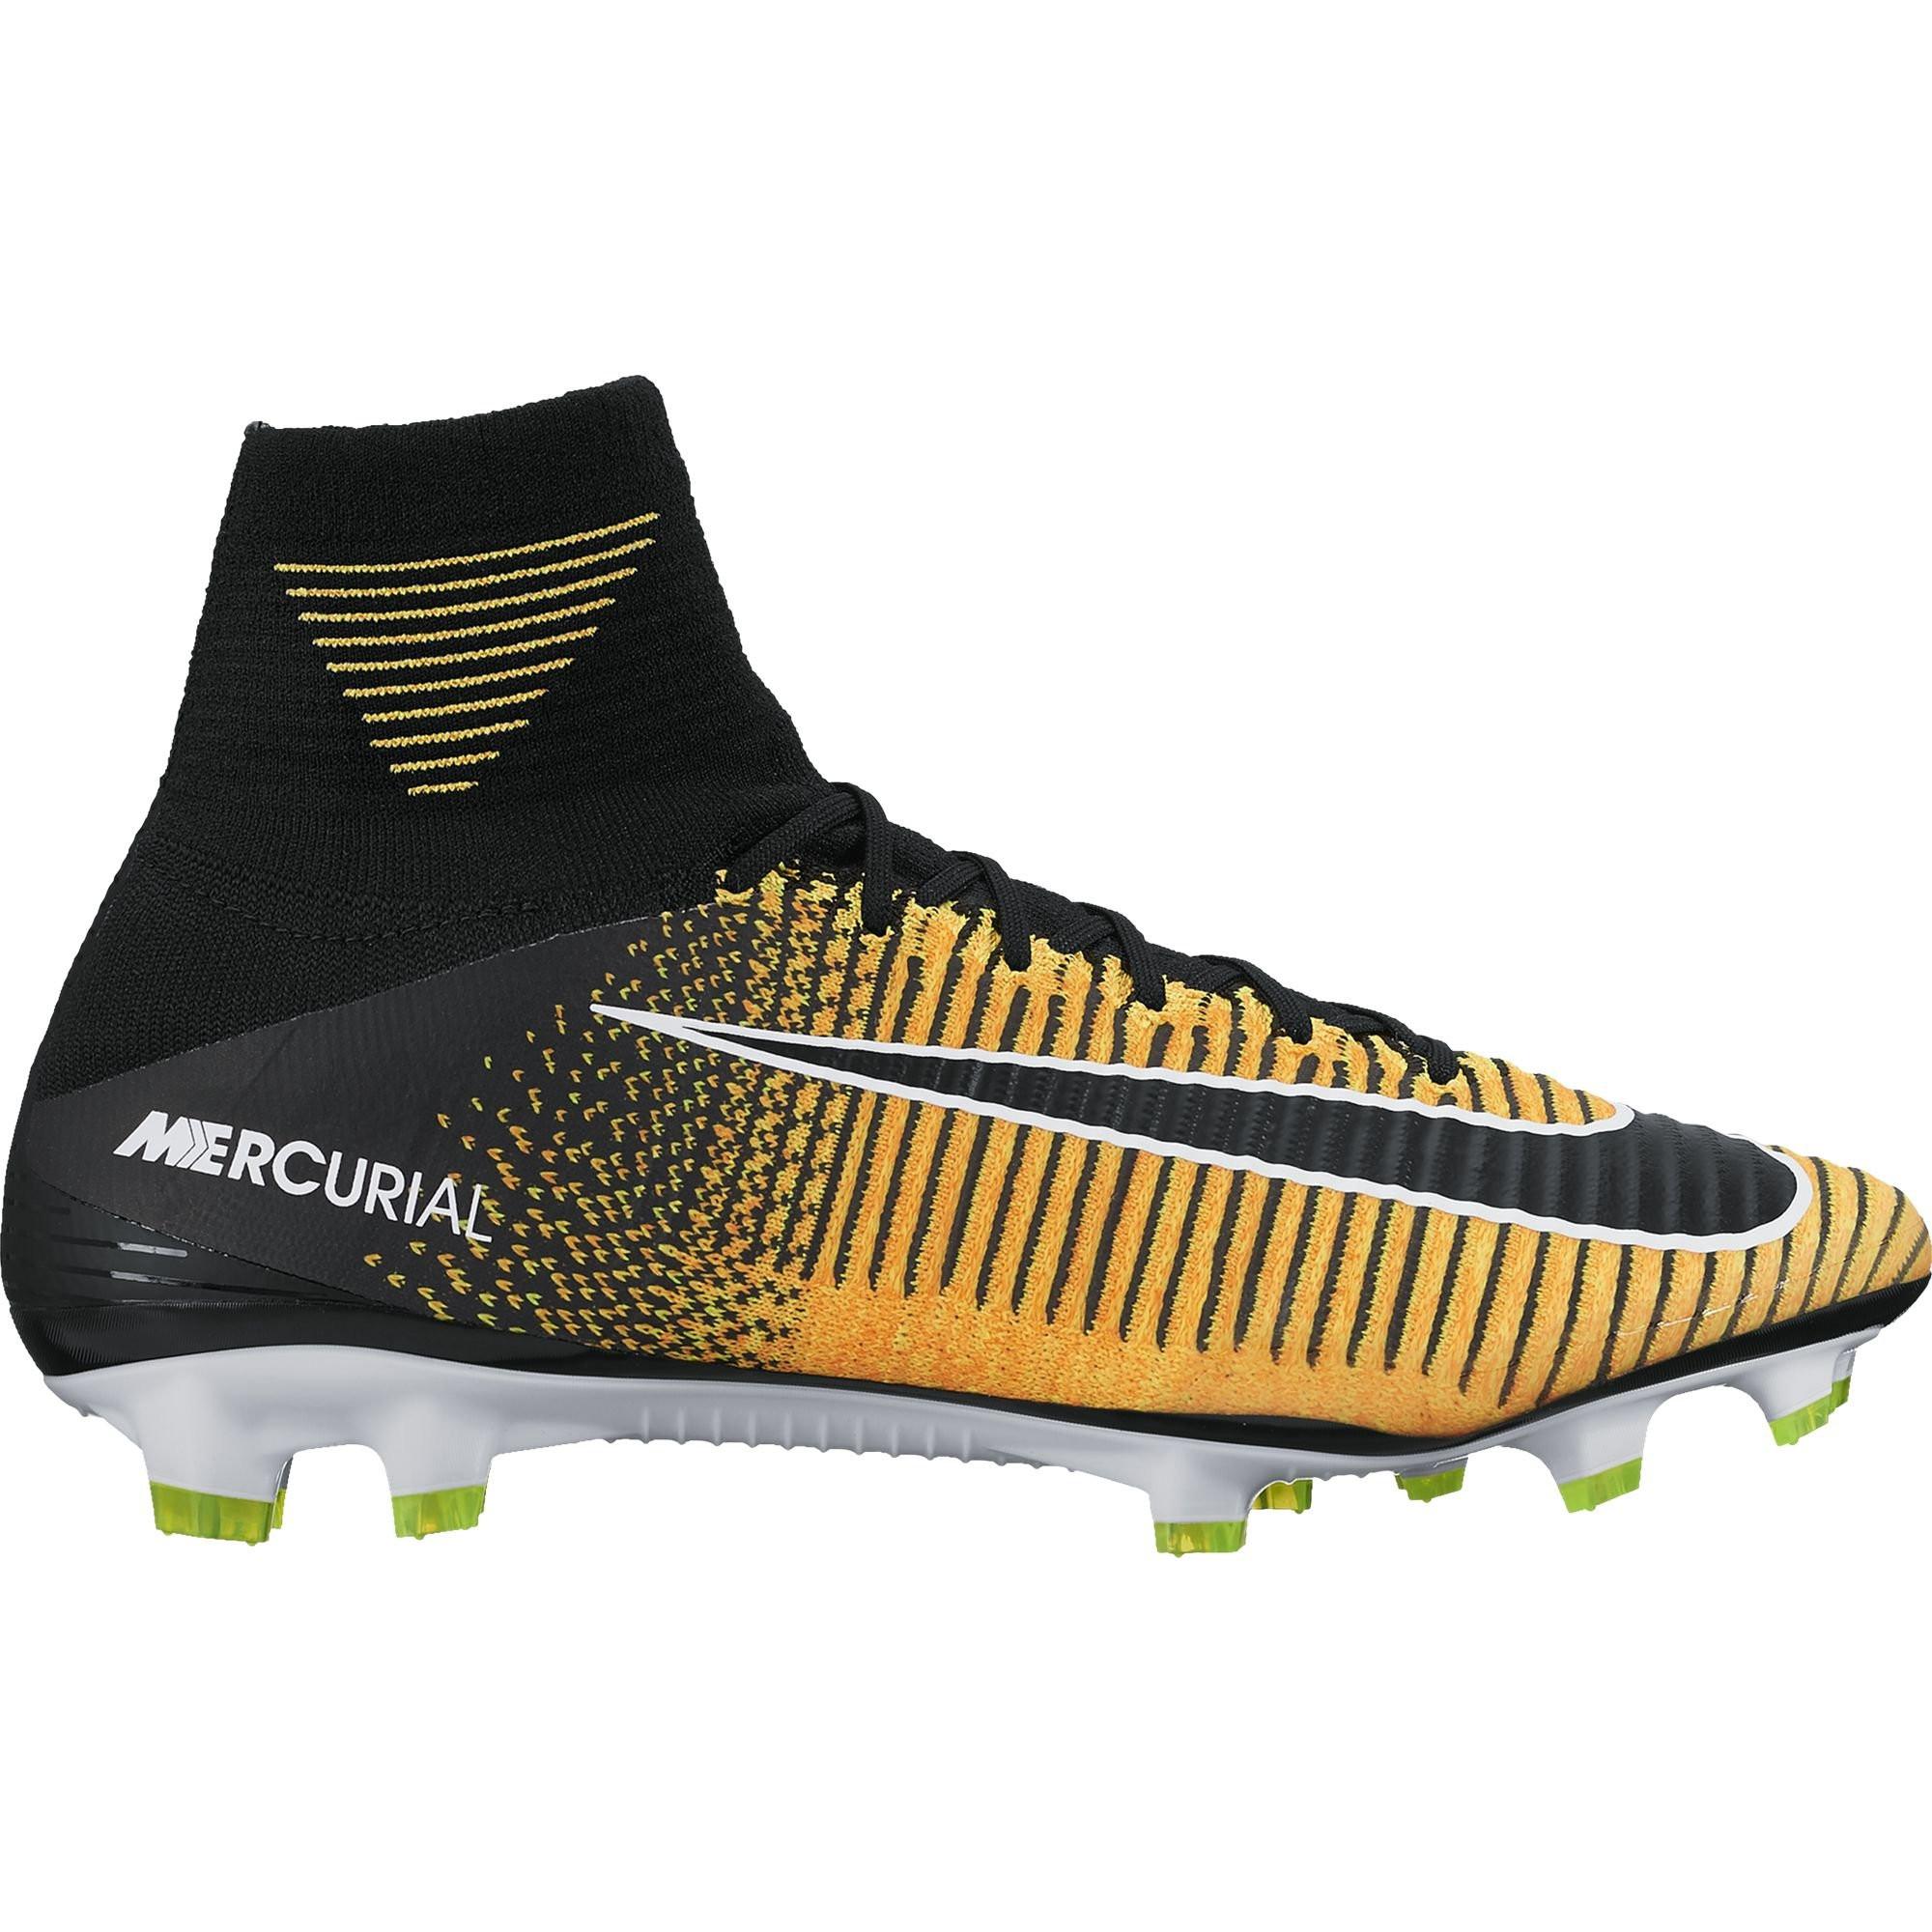 Nike mercurial superfly 6 df fg jaune 2017 2018 nike for Univers du jardin maule 78